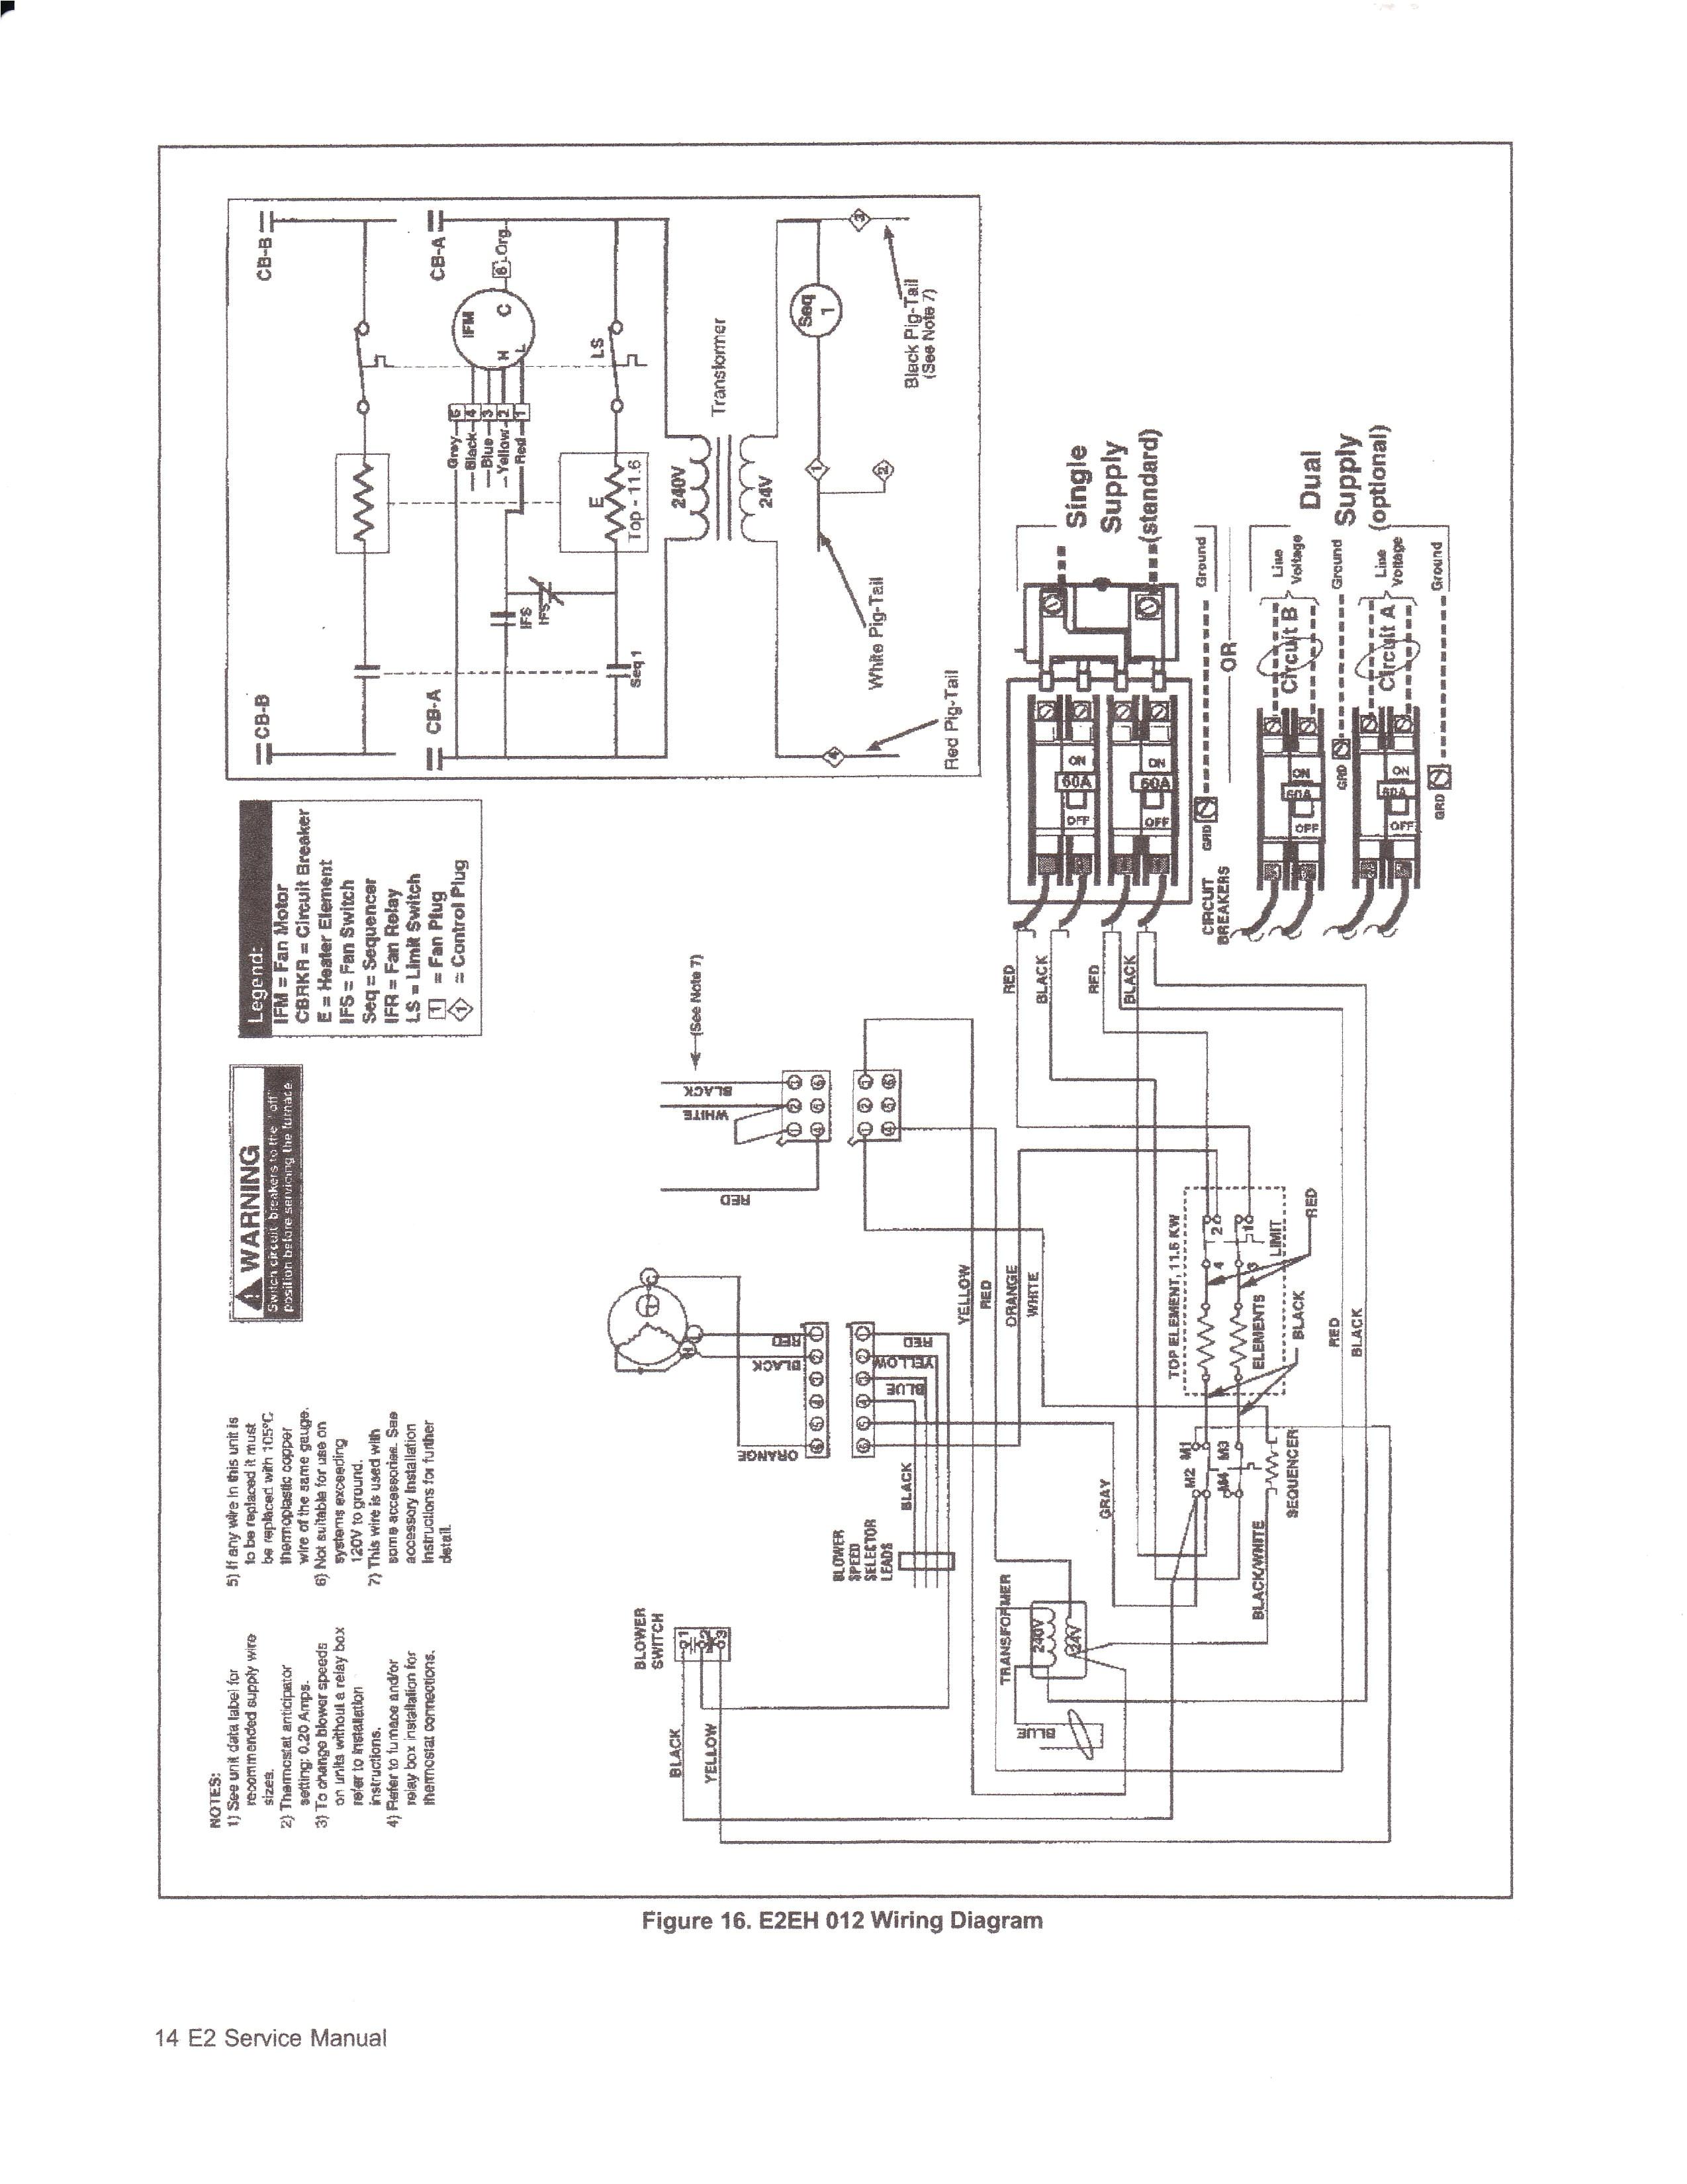 e1eb 015ha wiring diagram wiring diagram autovehicle e1eb 015ha wiring diagram